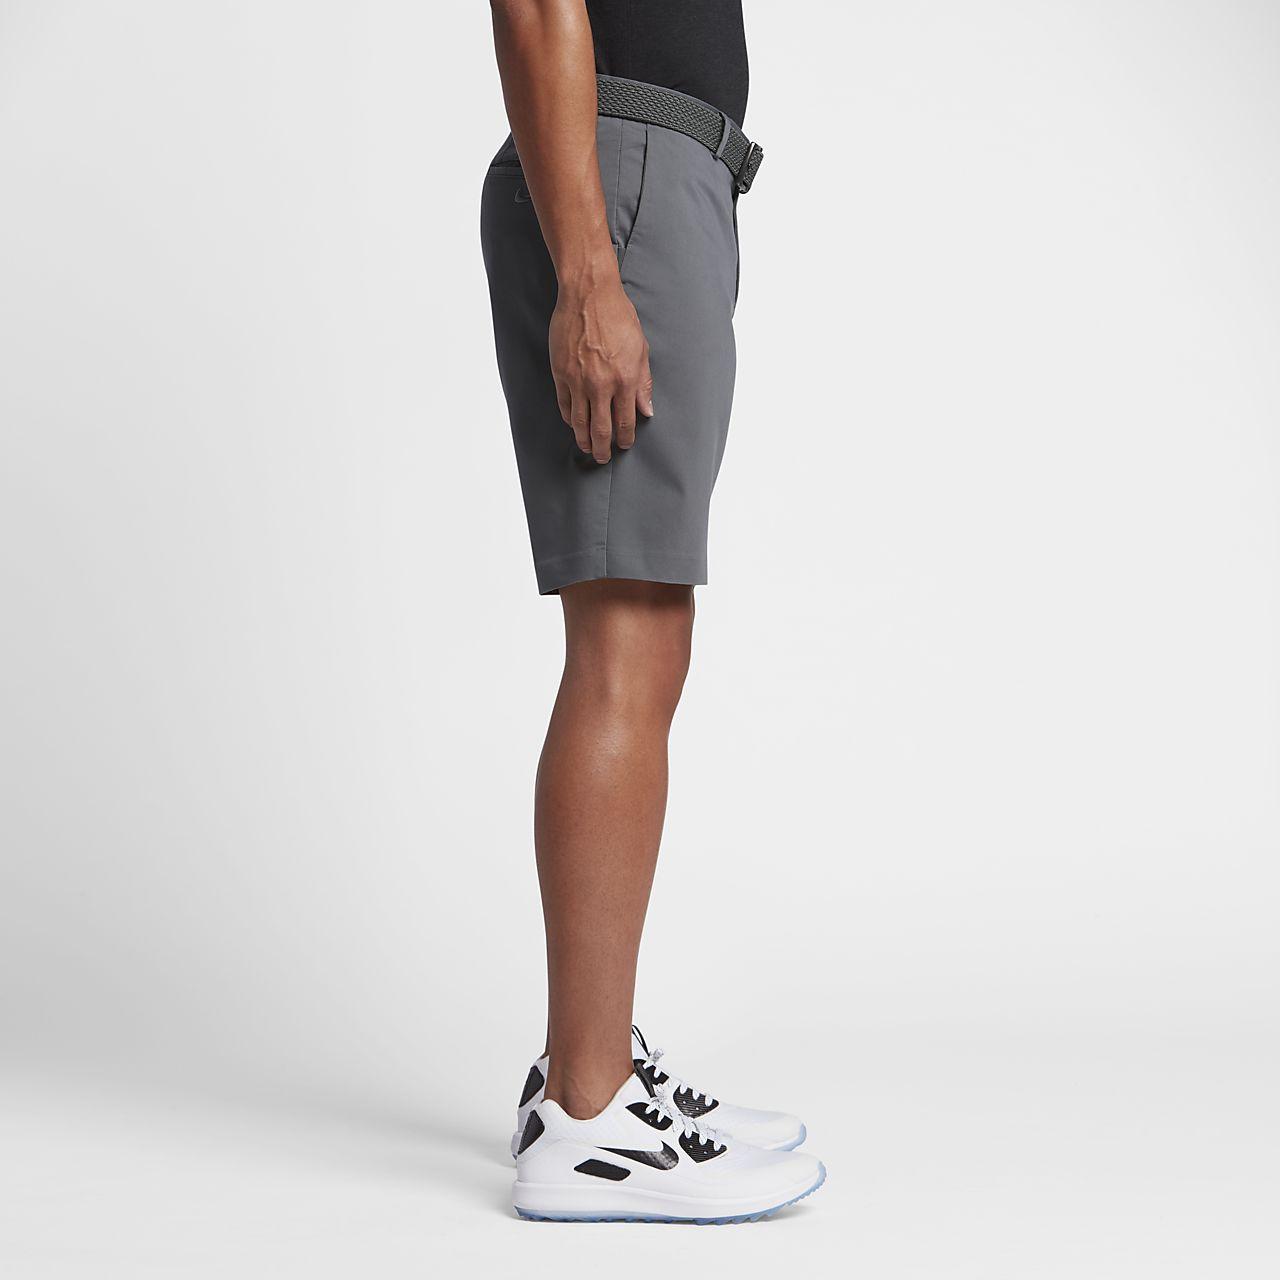 3026f7e98 Nike Flex Short Slim Washed Men's Golf Shorts. Nike.com ID